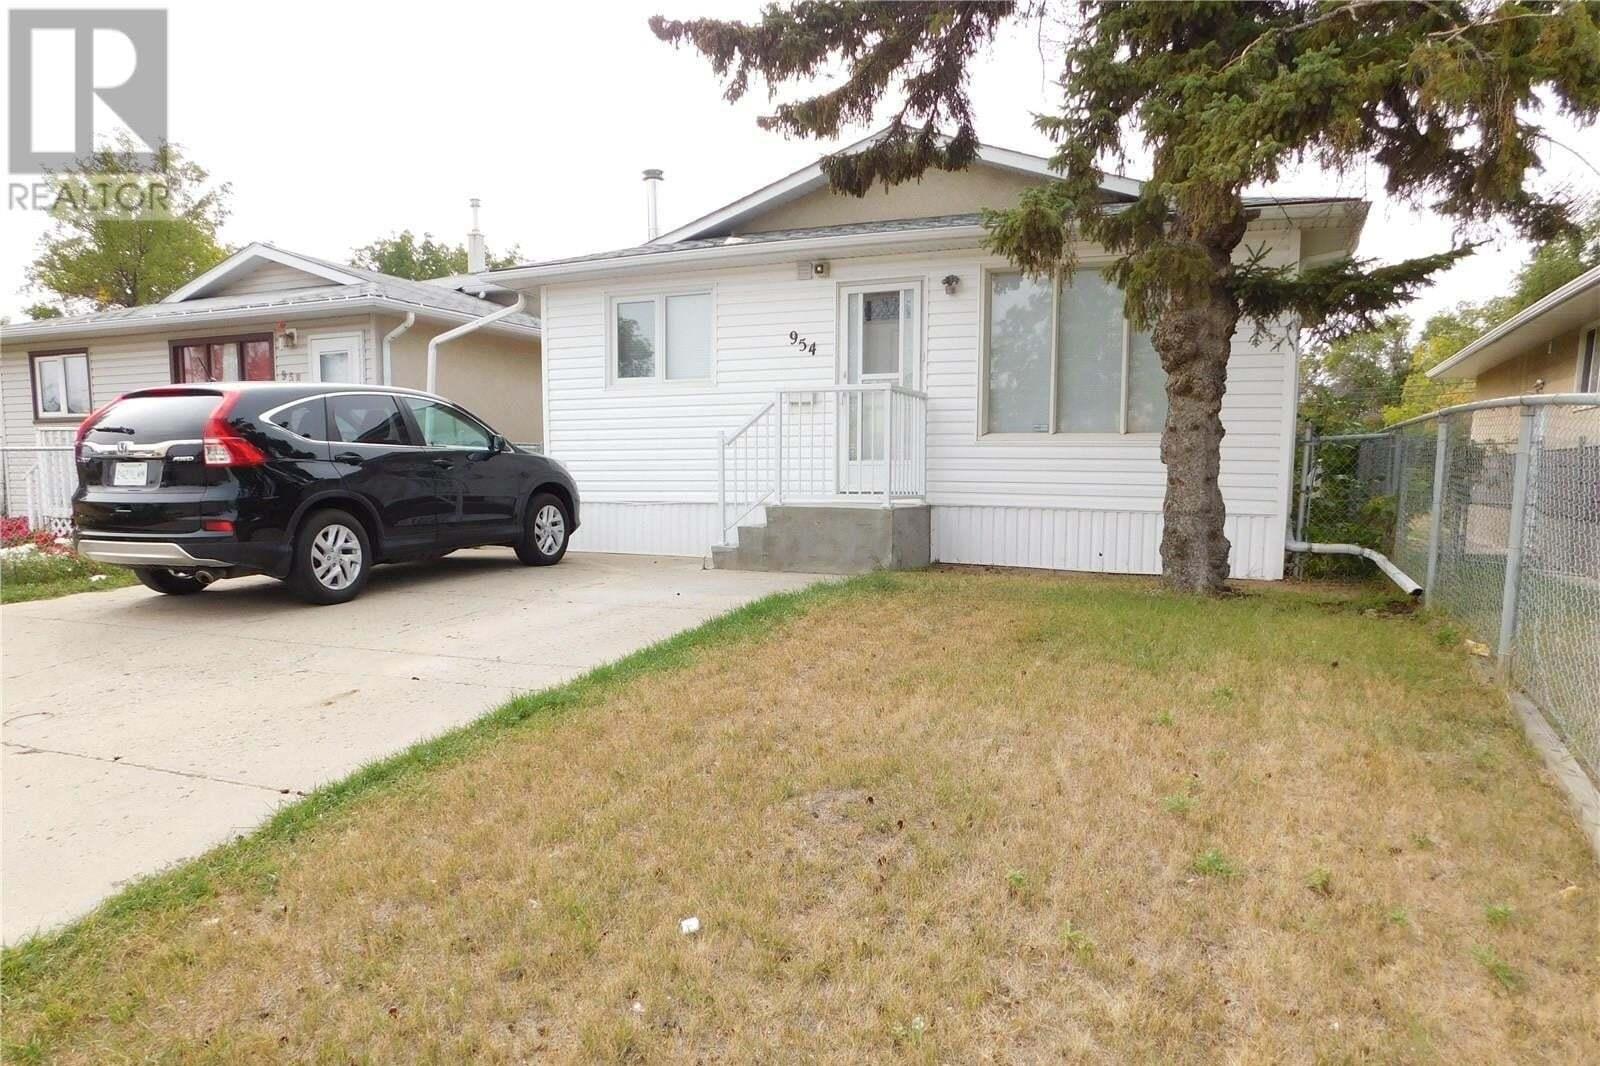 House for sale at 954 Angus St Regina Saskatchewan - MLS: SK826765